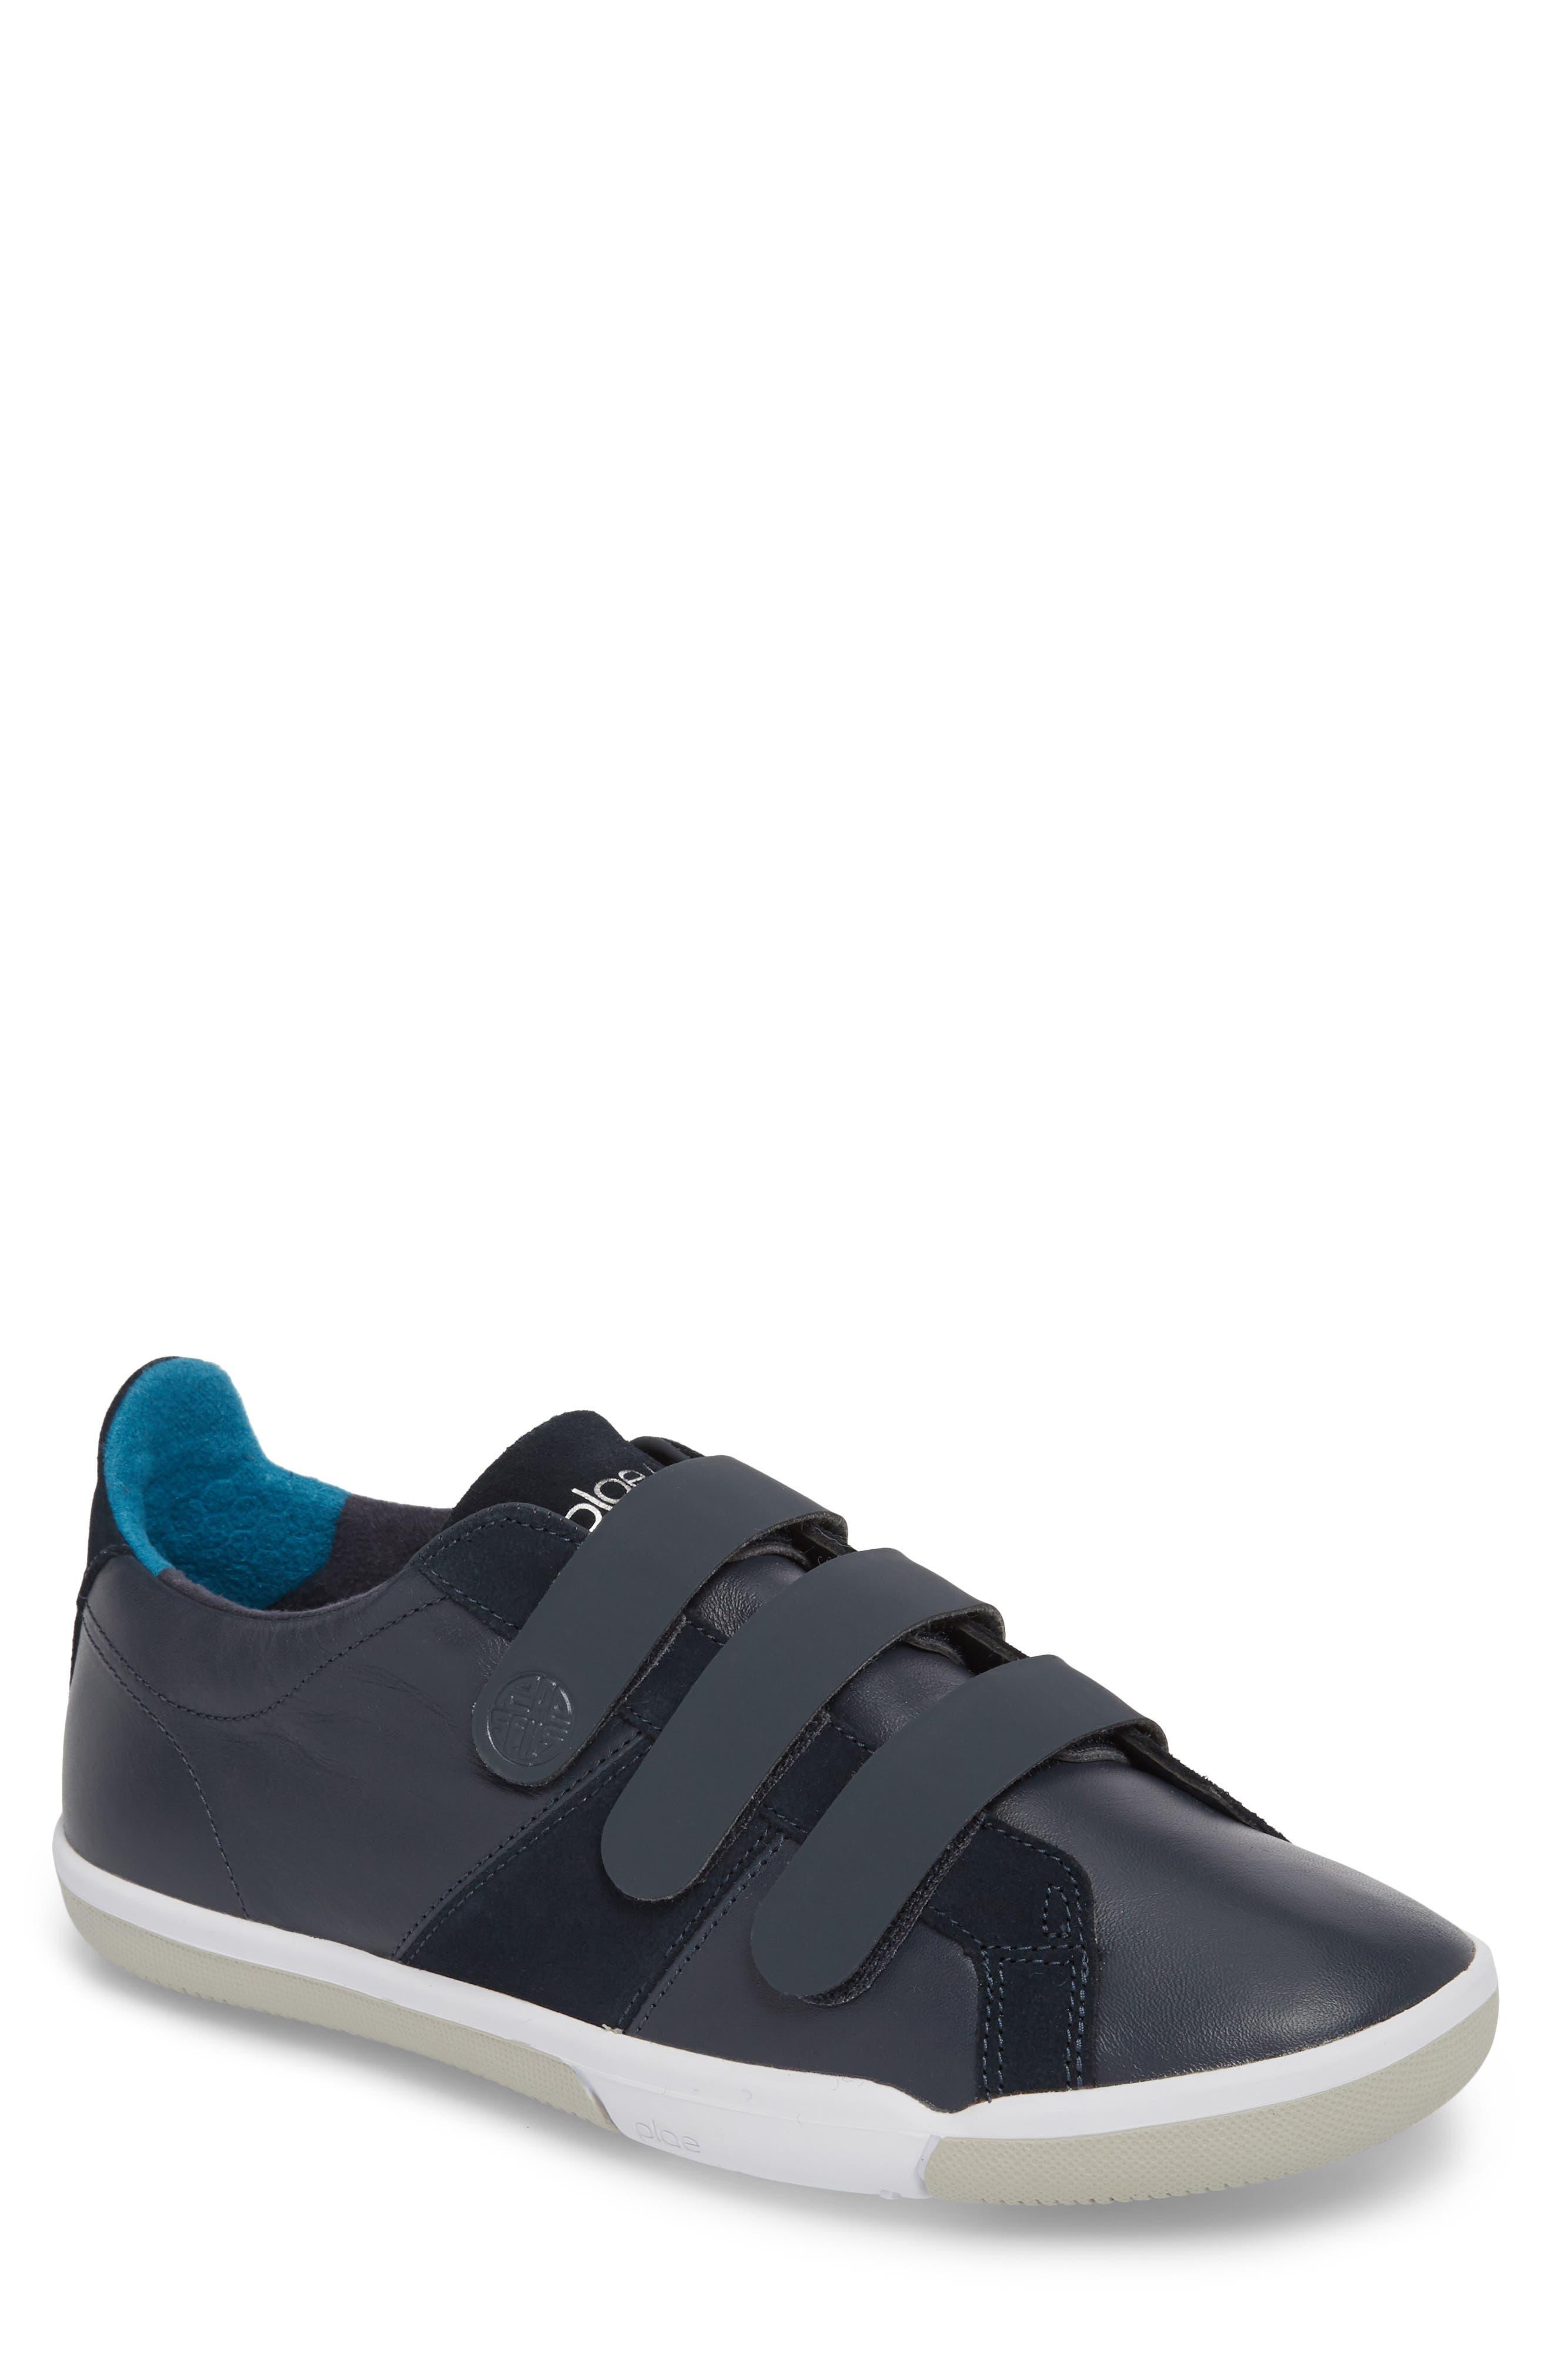 Larkin Low Top Sneaker,                         Main,                         color, Blue Nights